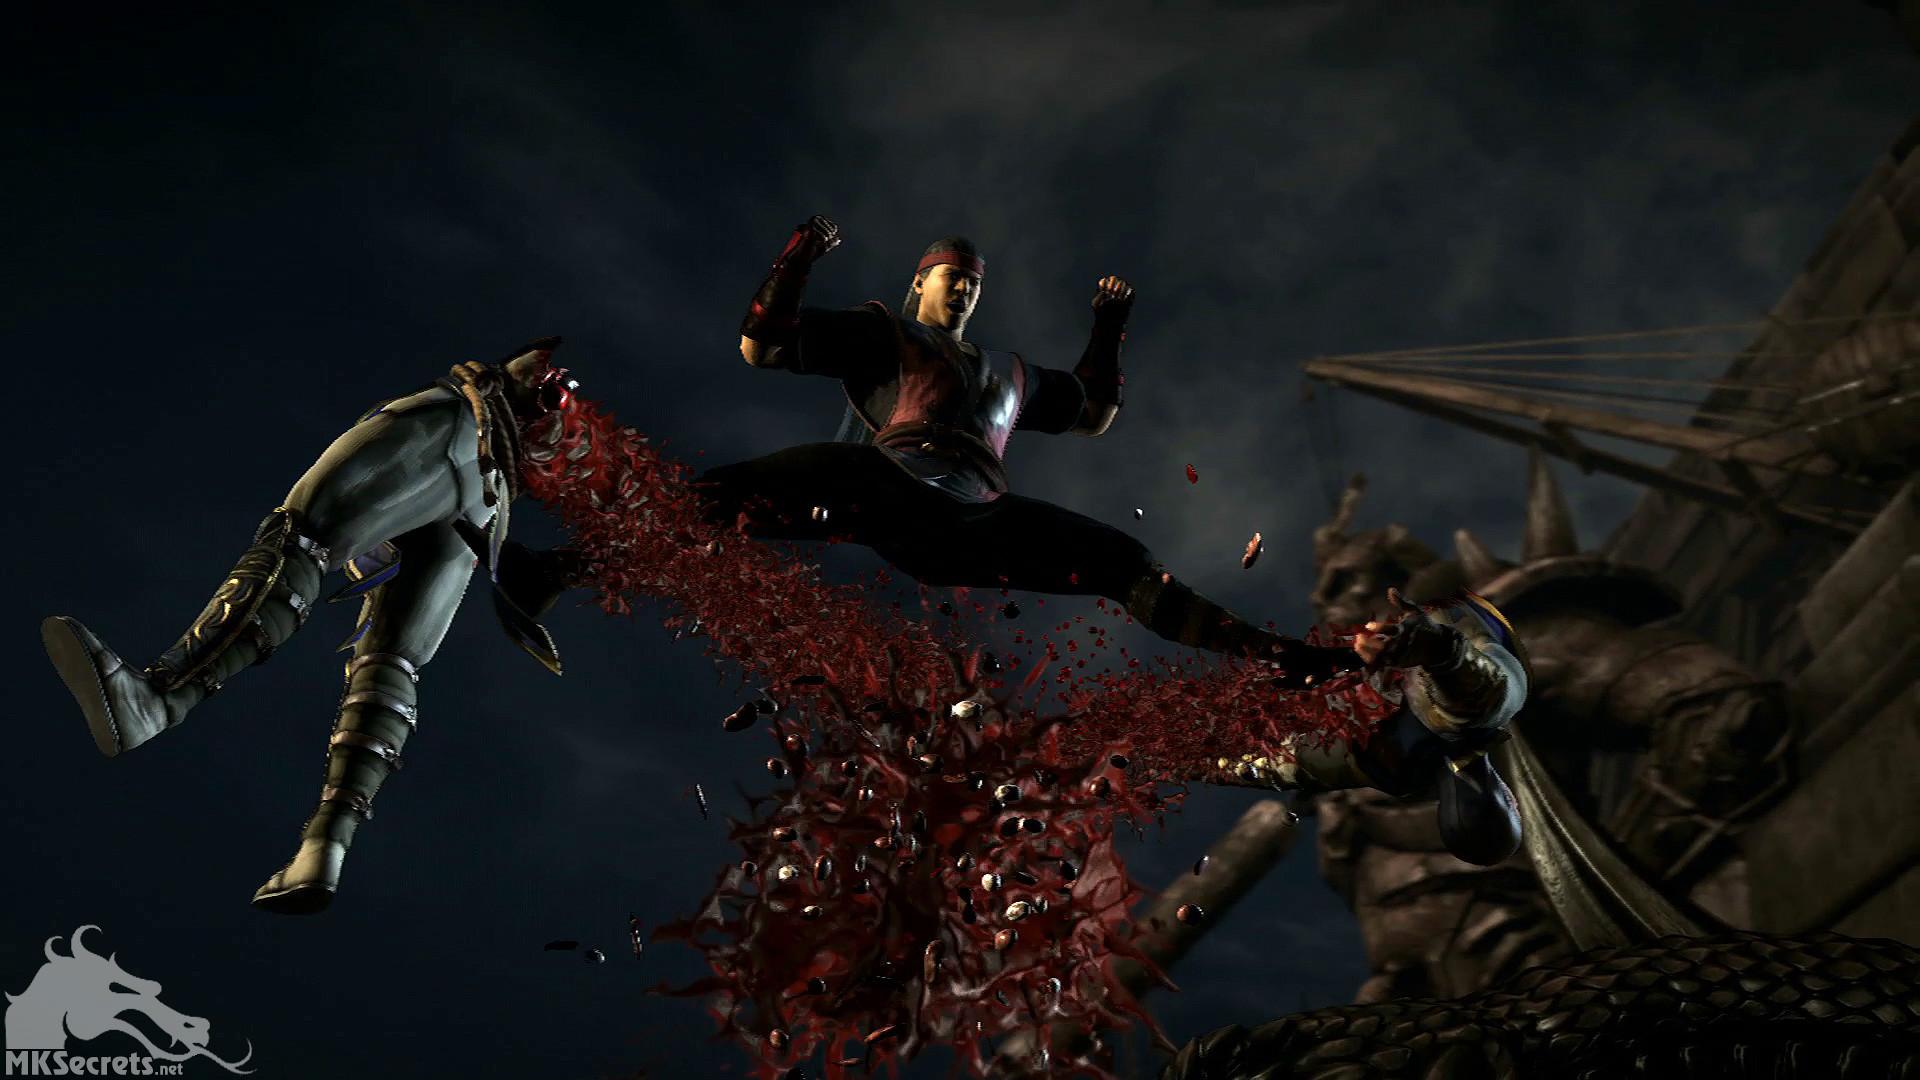 Mortal Kombat Liu Kang Wallpaper (78+ images)